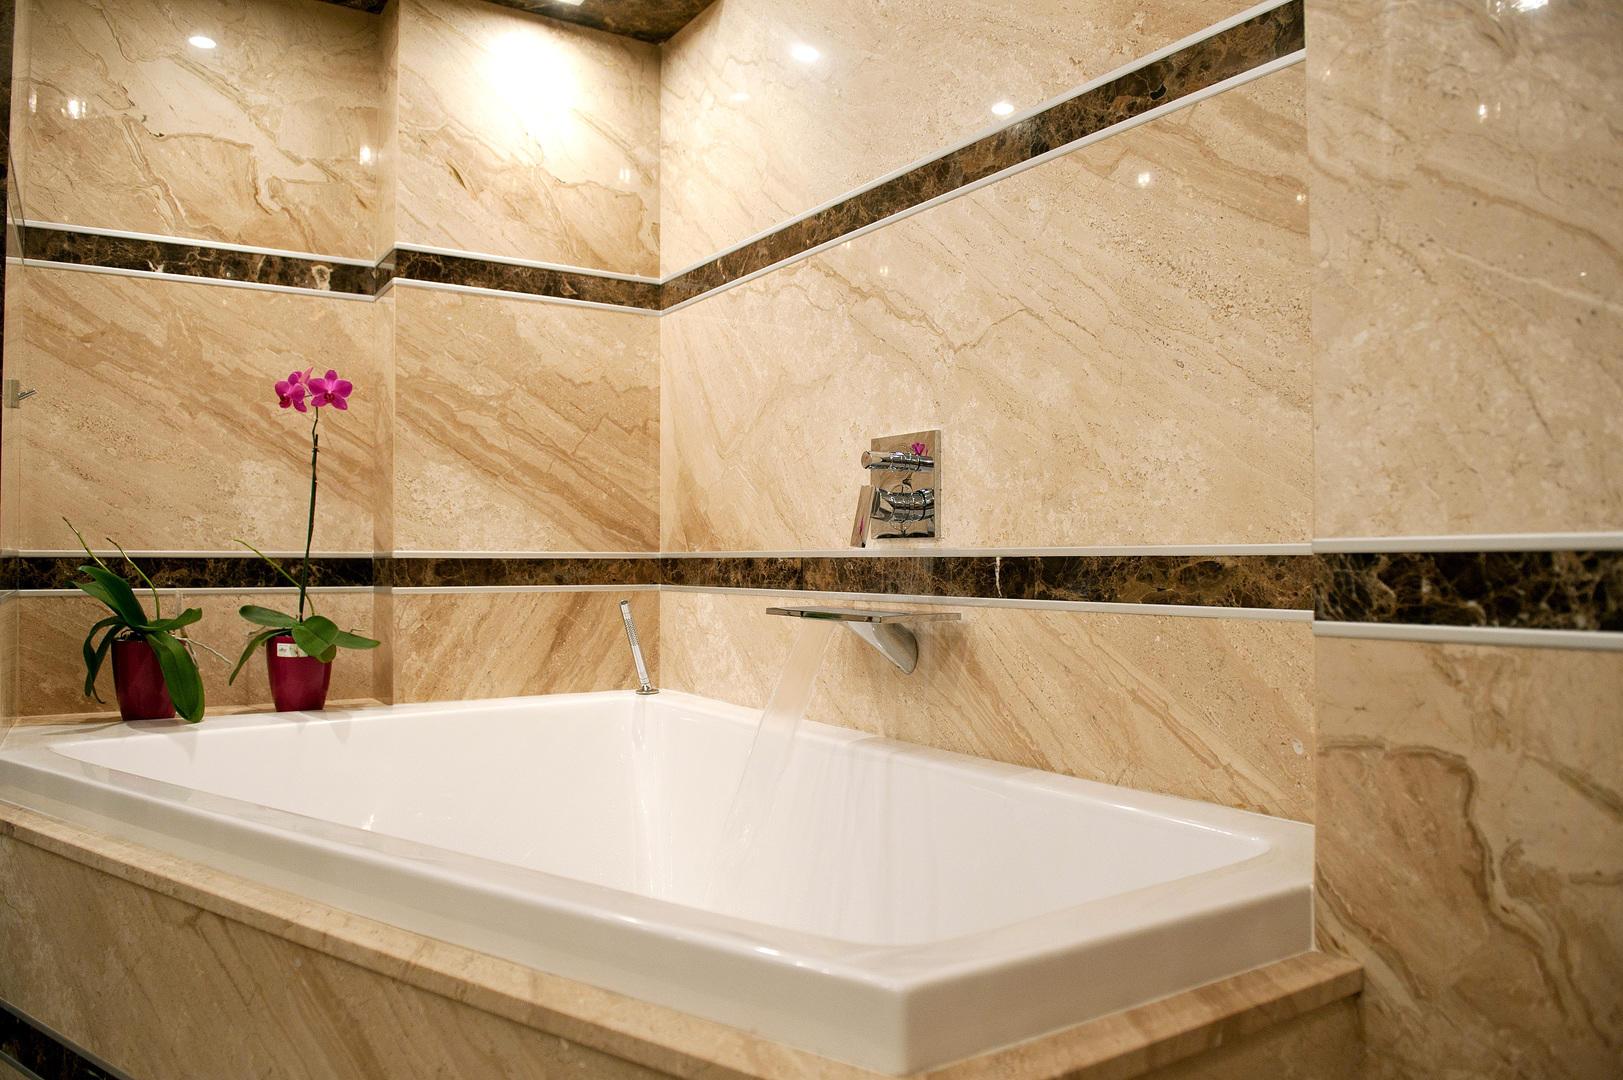 Ванная комната из светлого и темного мрамора